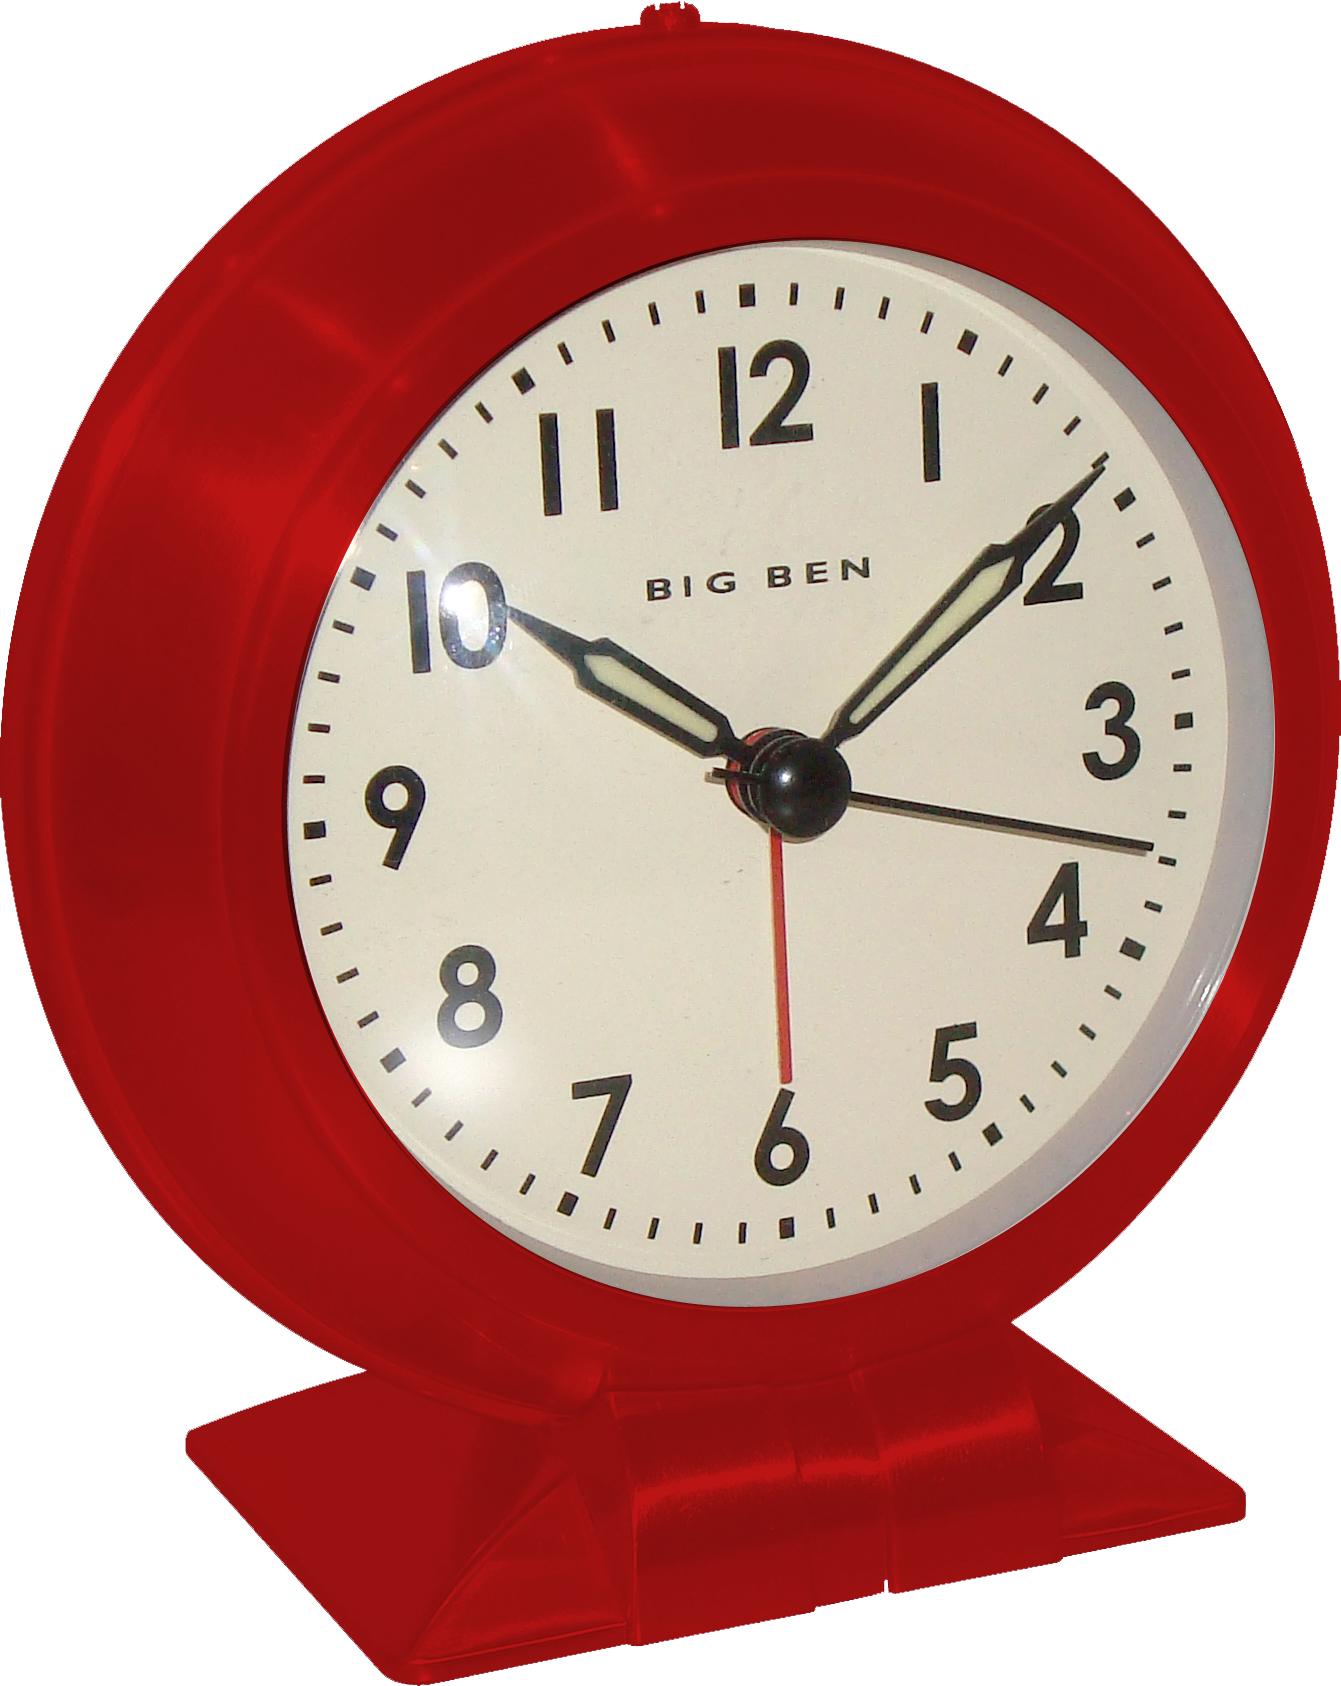 Westclox Big Ben Classic Red Alarm Clock Small Size 90010r Alarm